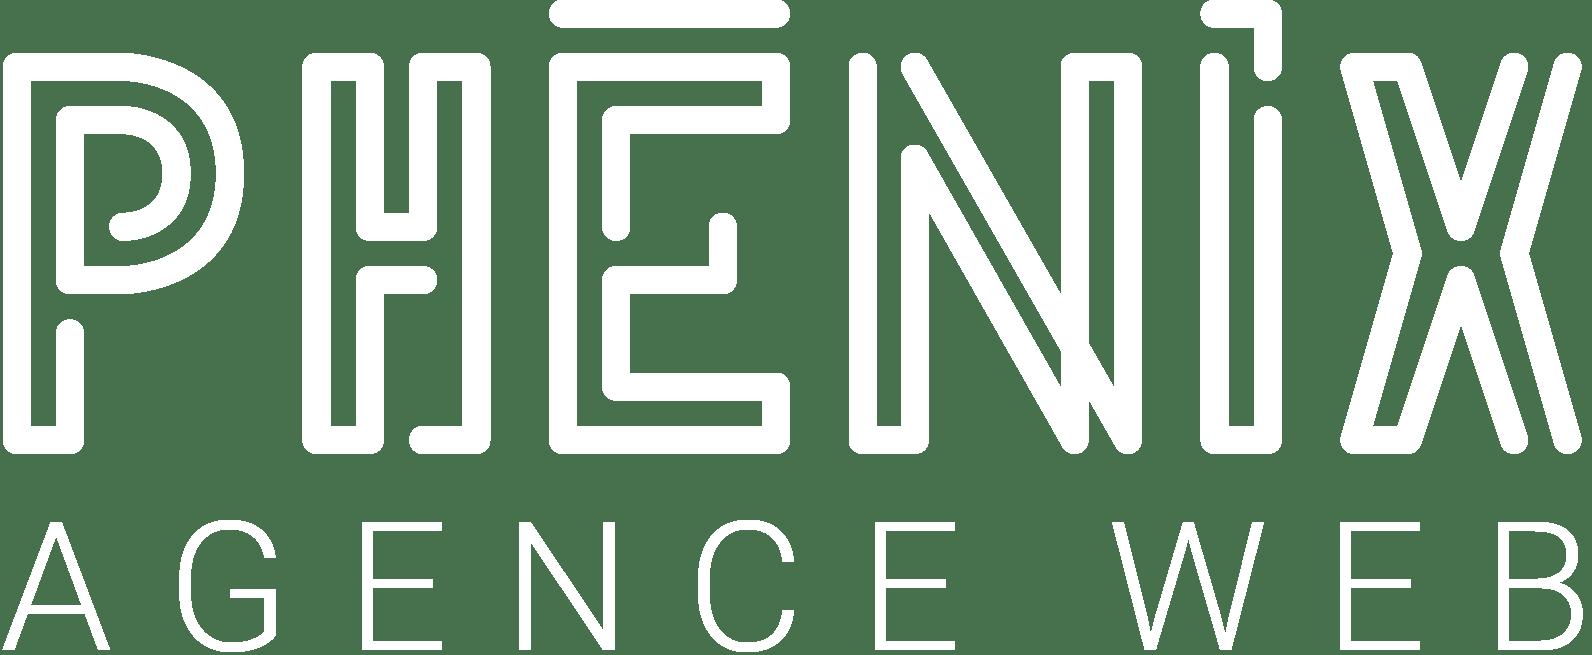 Phénix Agence web